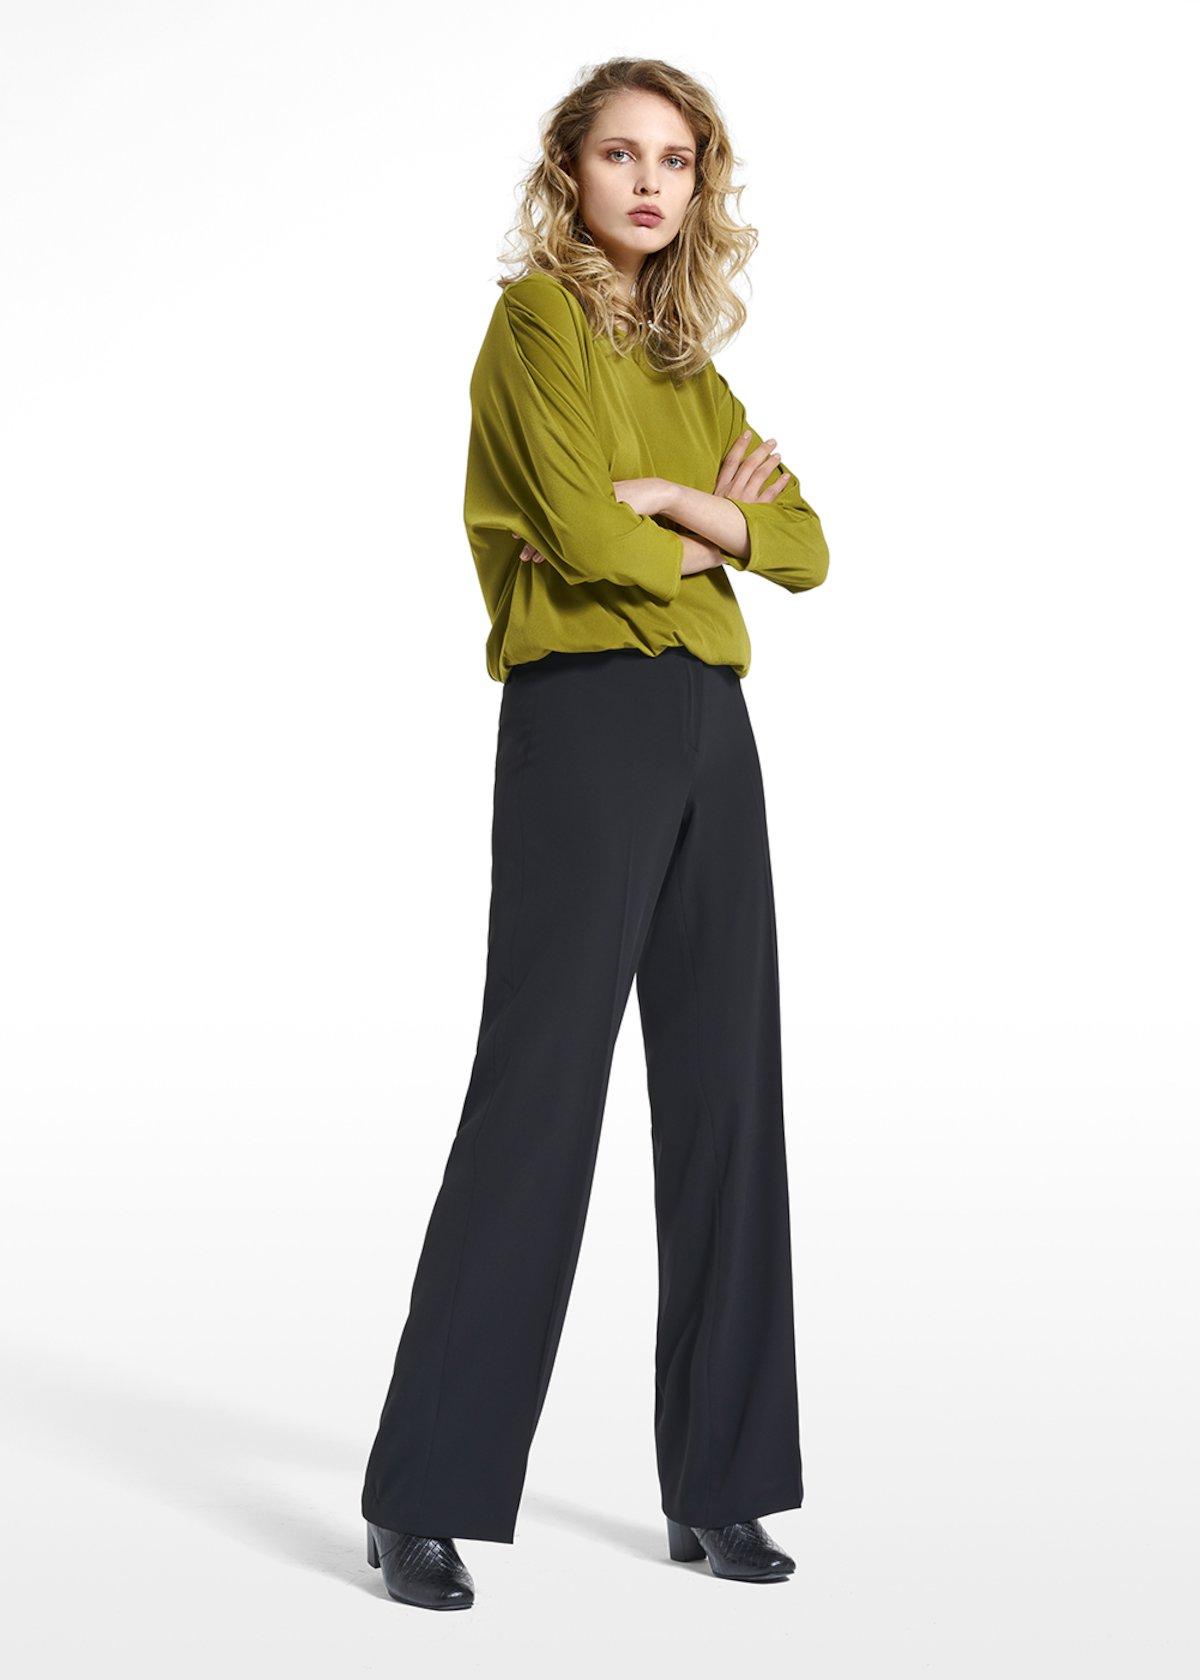 T-shirt Soraya in jersey crepe fabric - Avocado - Woman